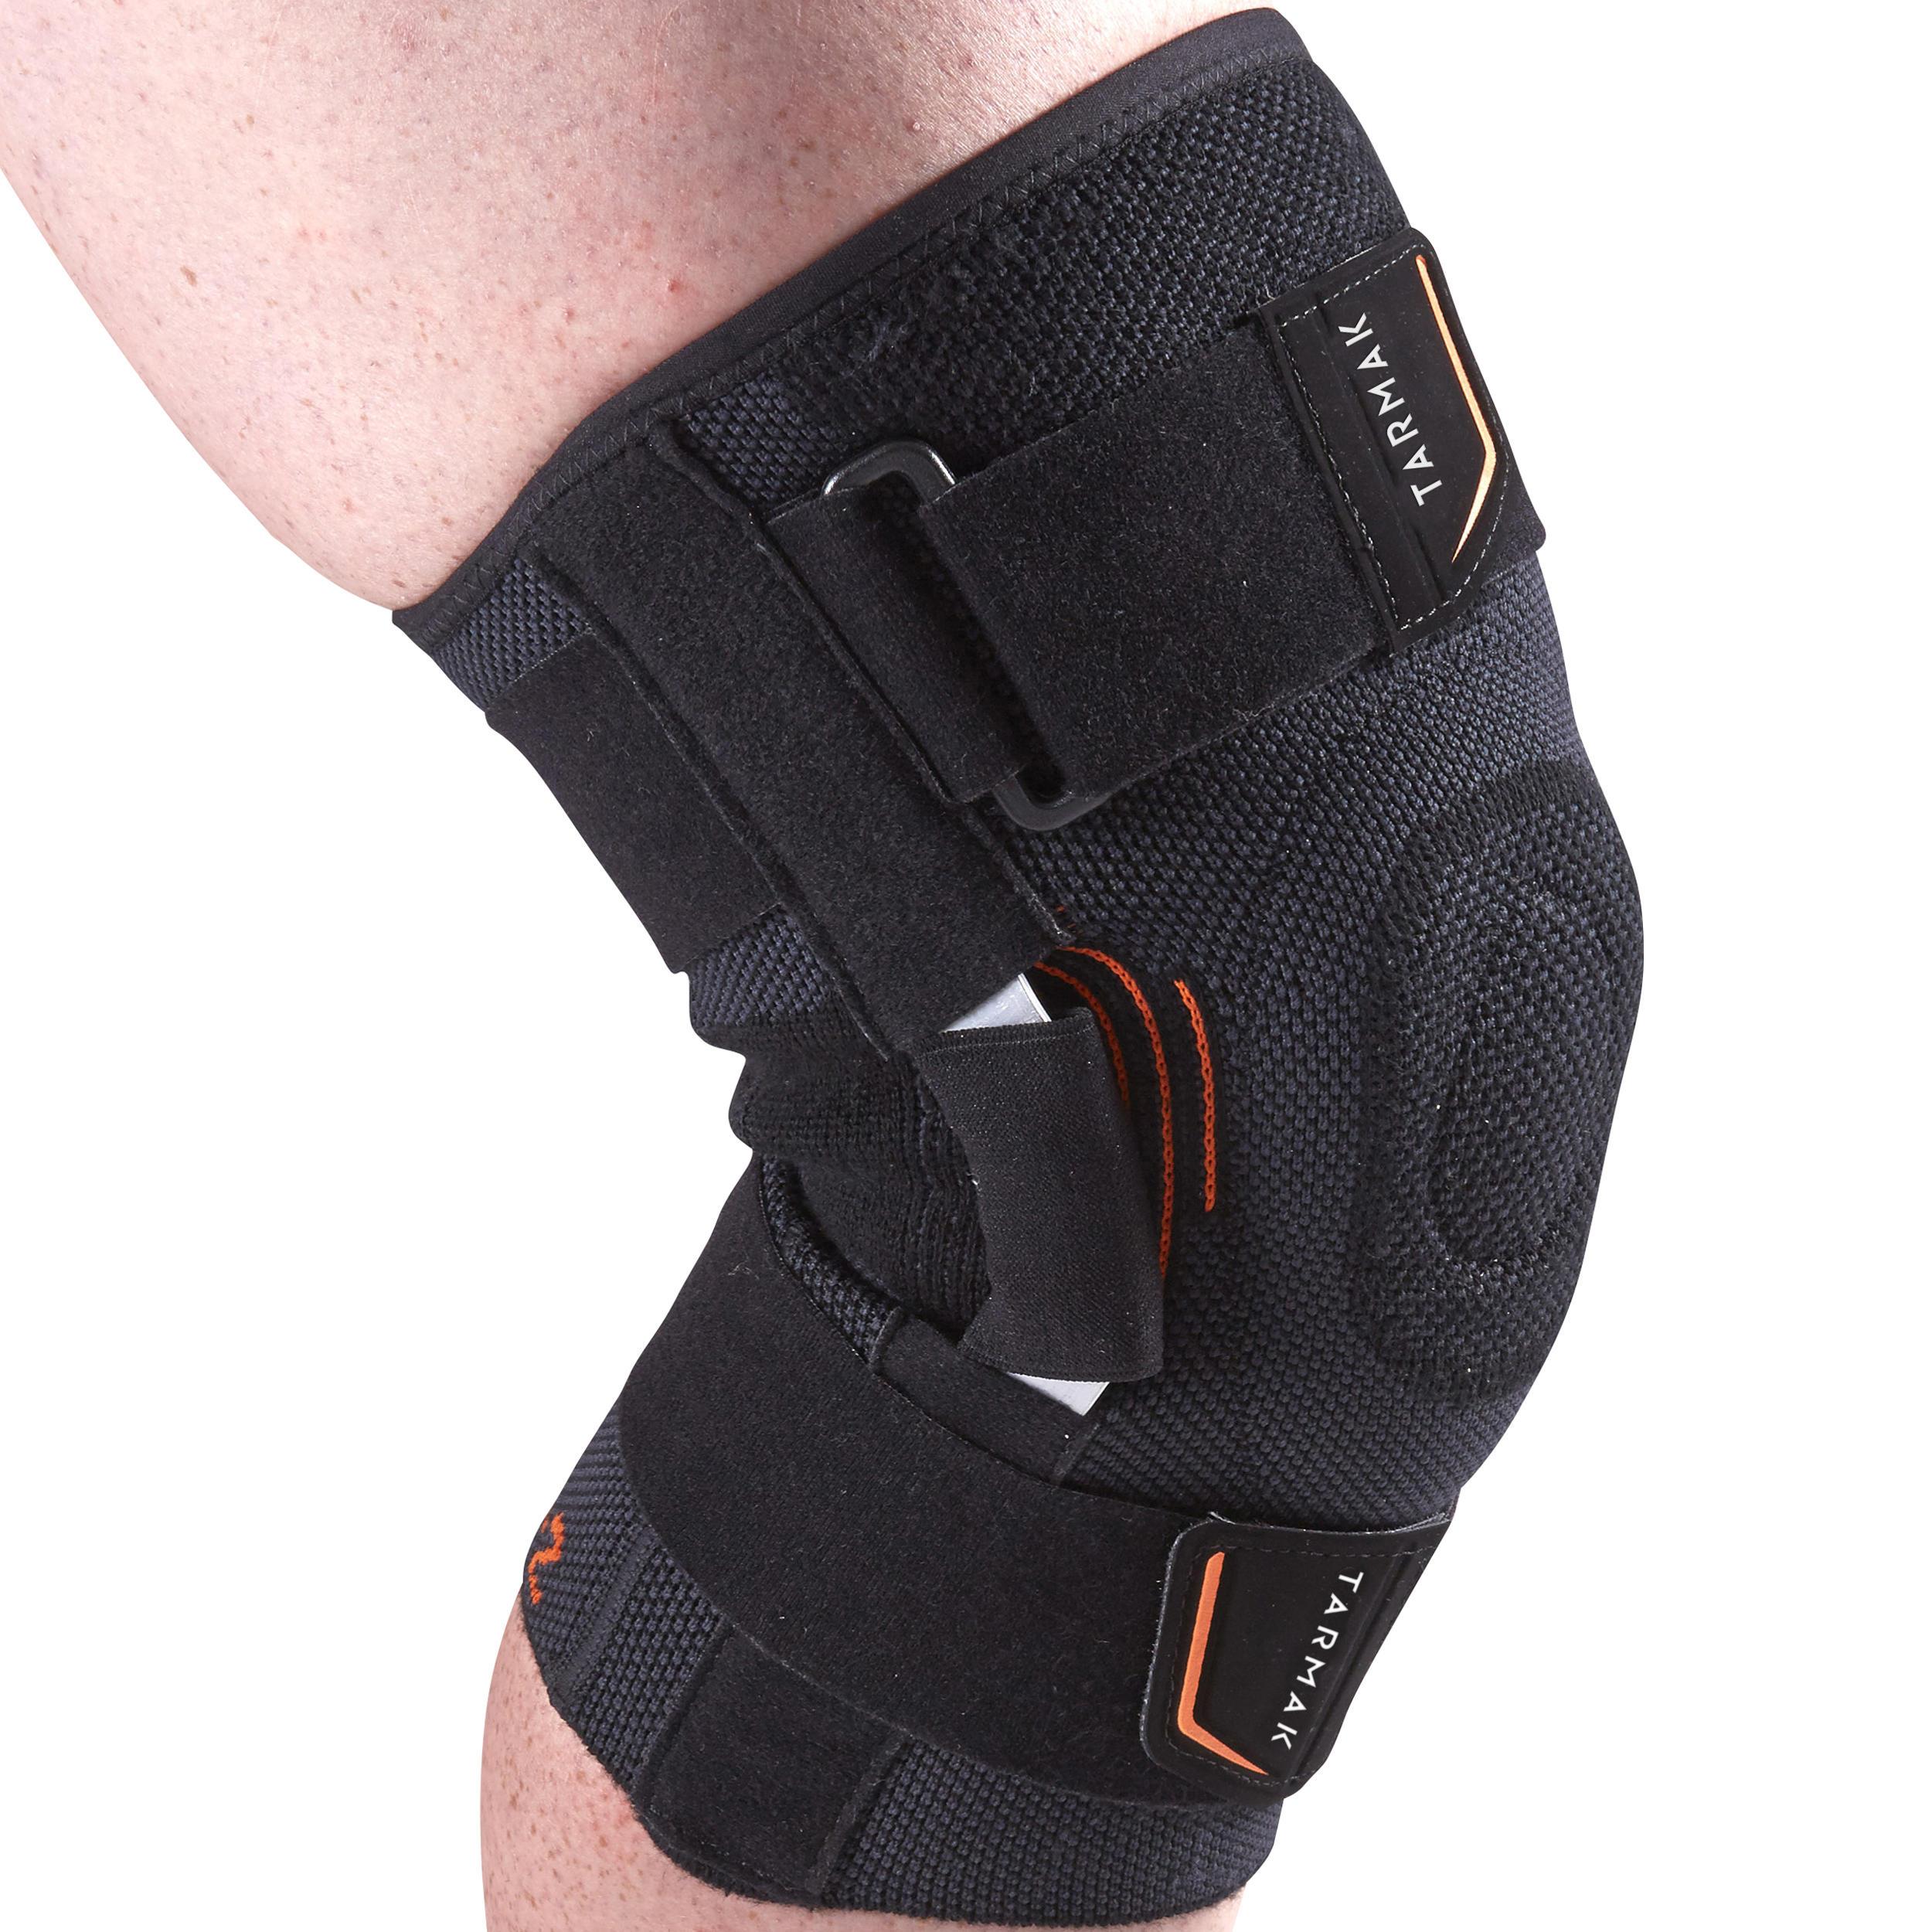 Strong 700 Right/Left Men's/Women's Knee Ligament Support - Black